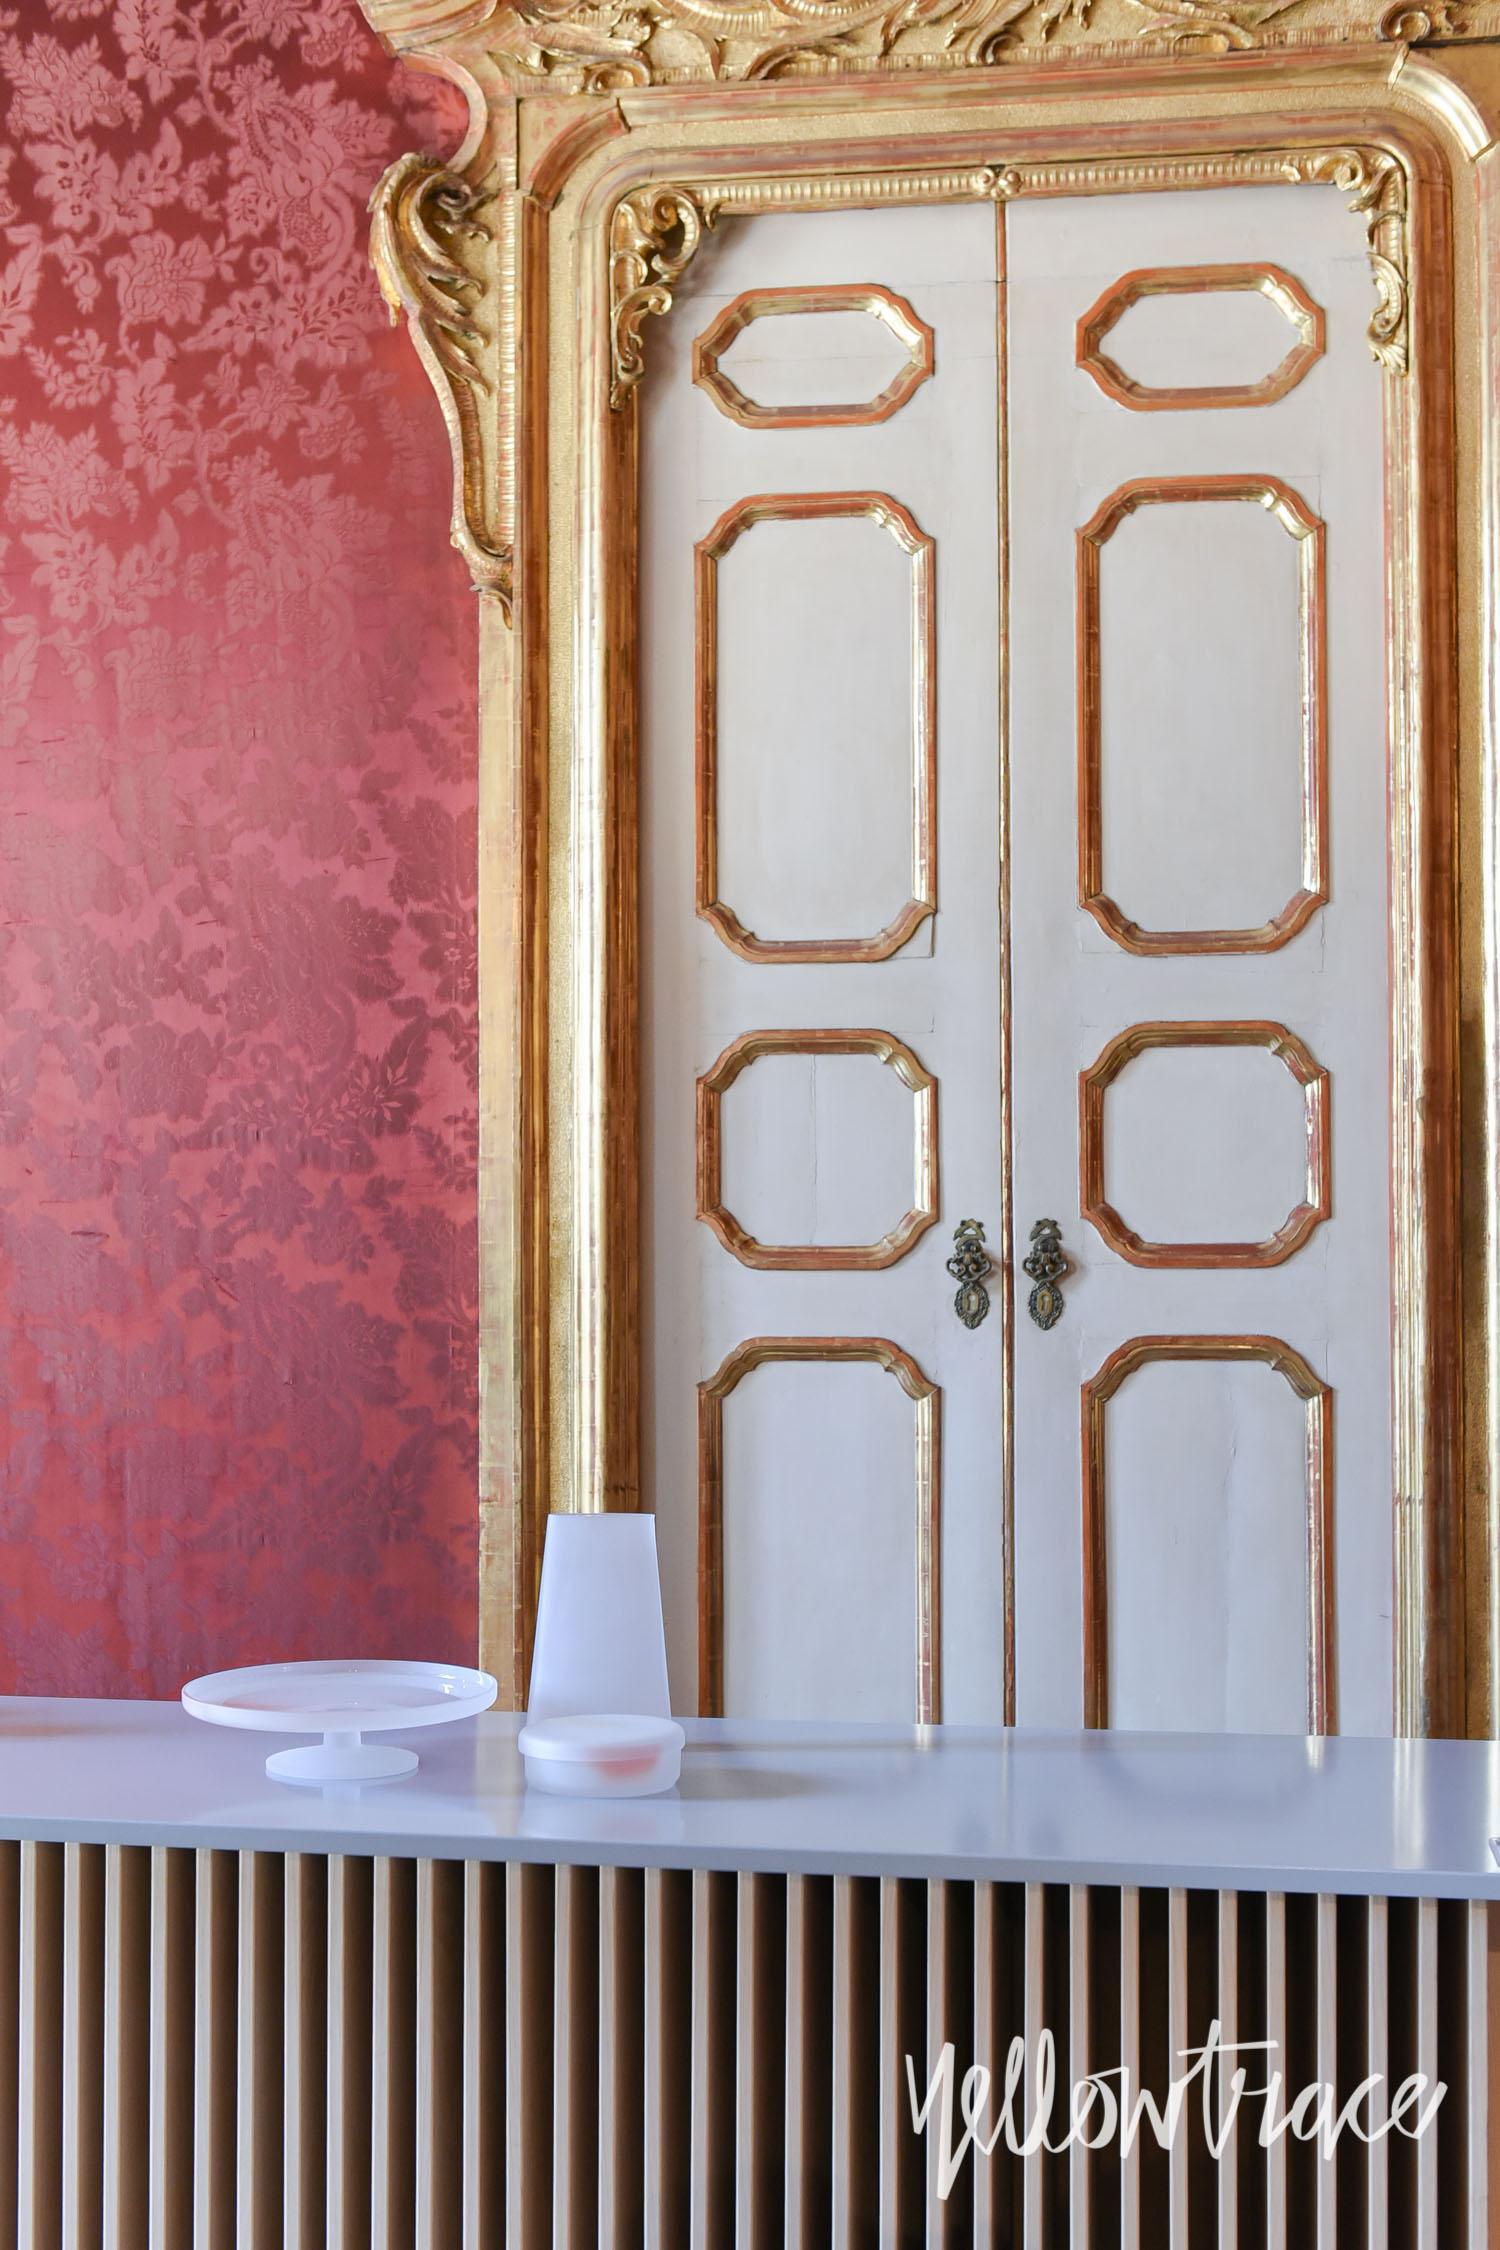 Milan Design Week 2017 Highlights, Formafantasma for Nude Glass at Palazzo Litta, Photo © Nick Hughes | #Milantrace2017